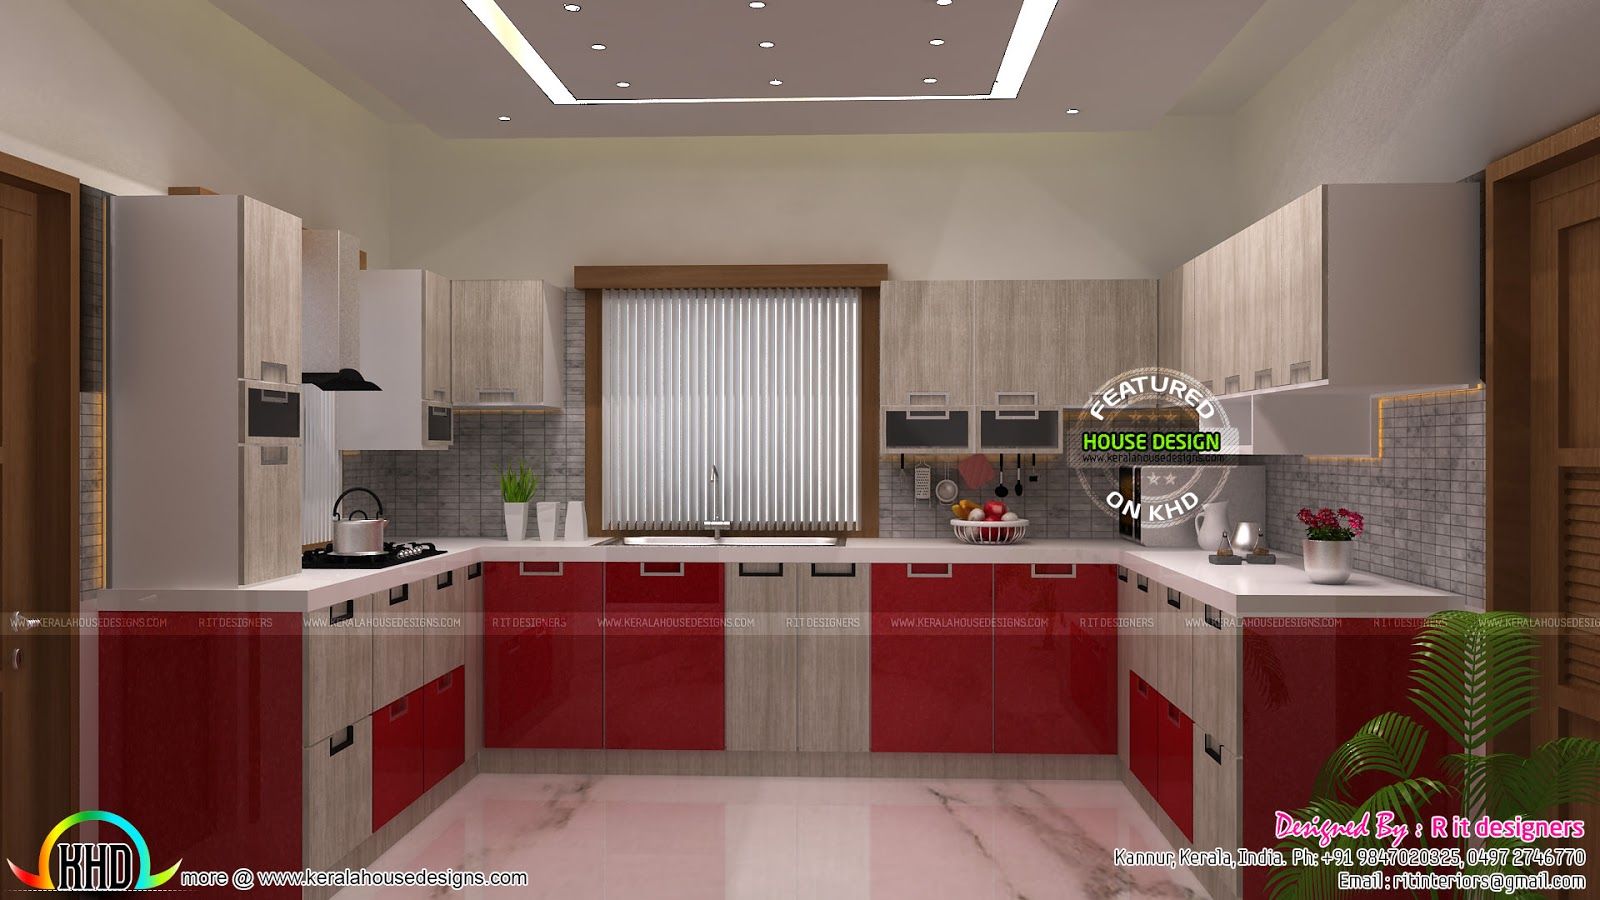 modular kitchen dining bedroom interiors kerala home design kitchen interiors modular kitchens chennai chennai interior